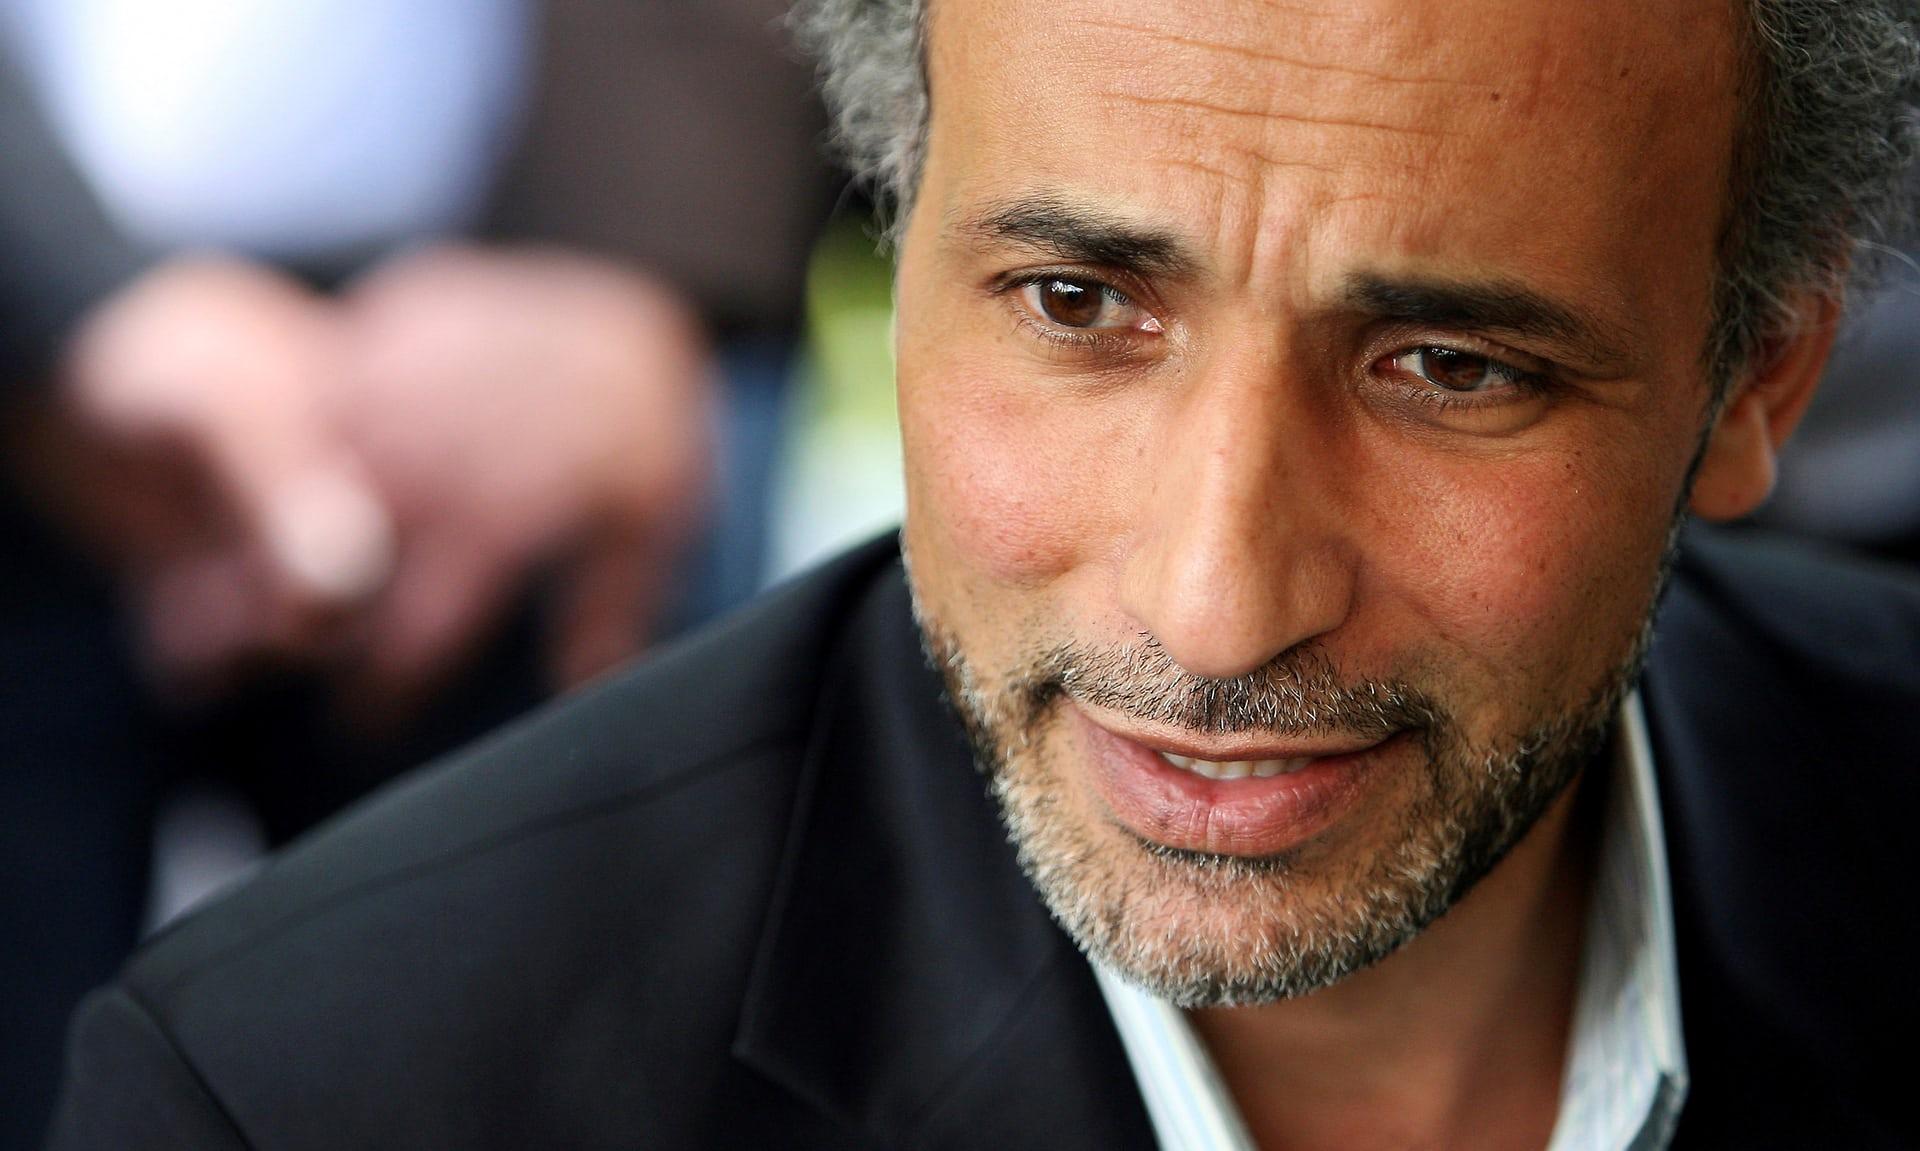 Whilst Tariq Ramadan has been released, his imprisonment raises fears for European Muslims